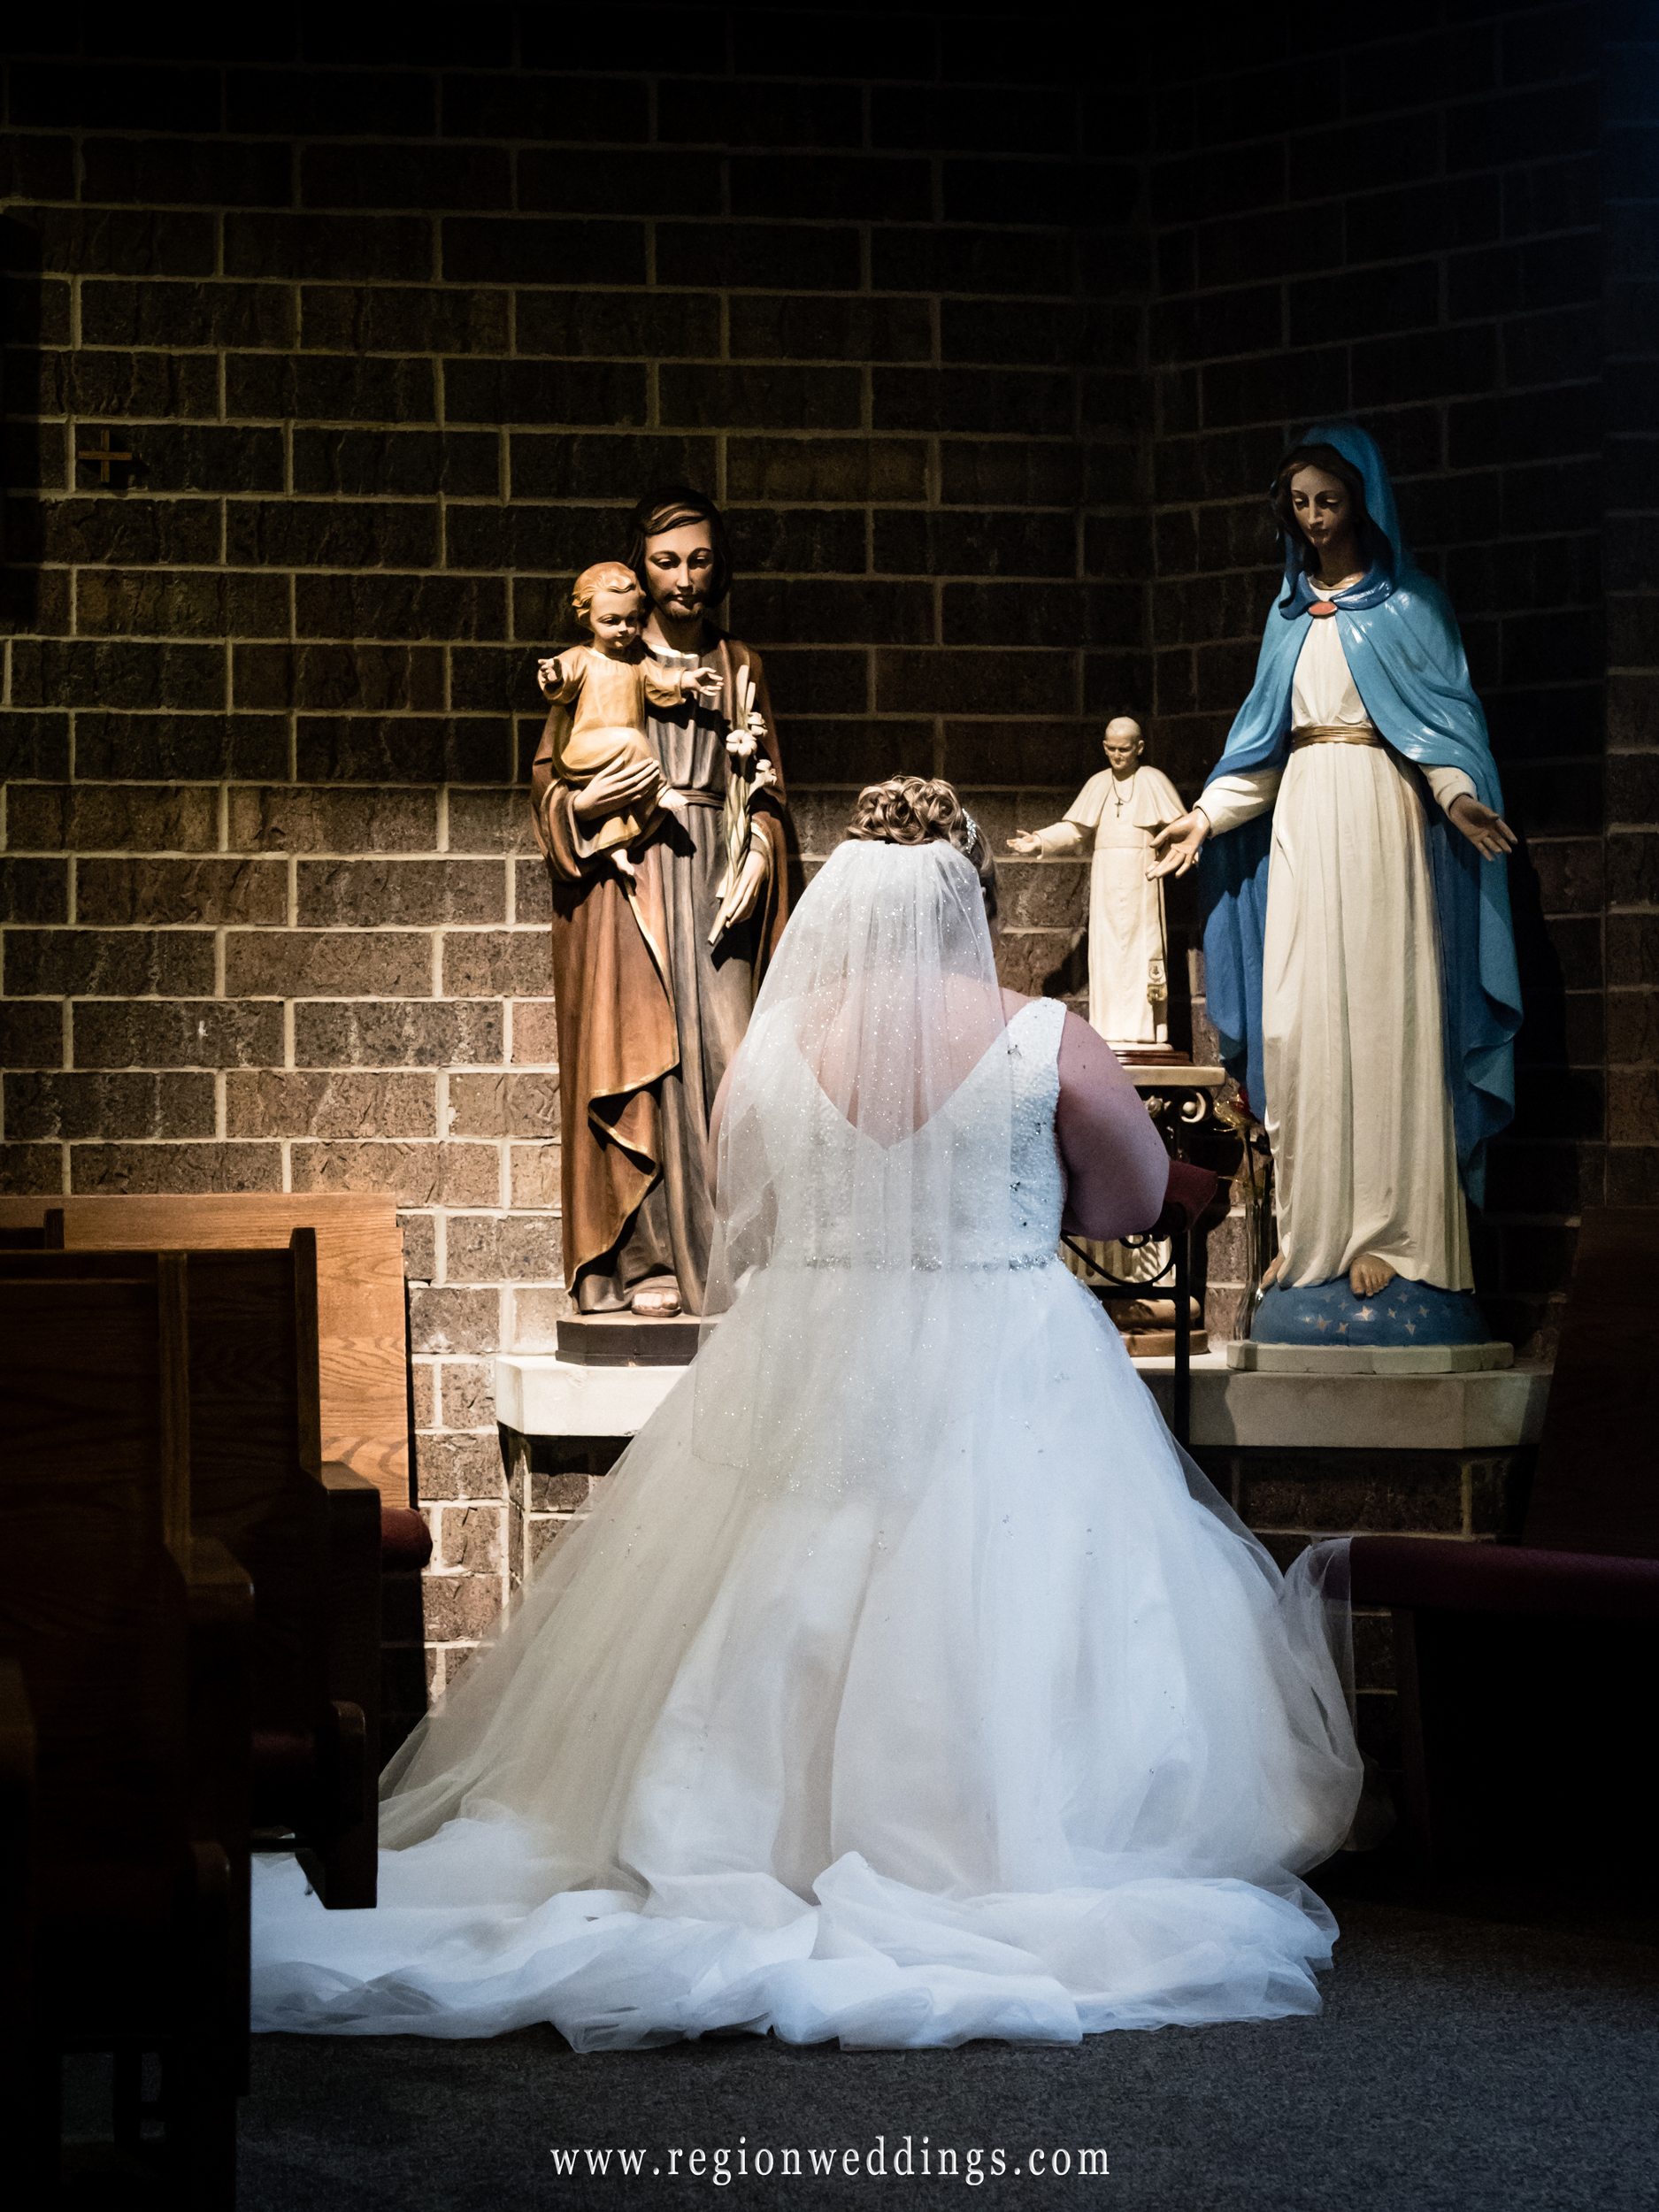 Bride kneeling in church.